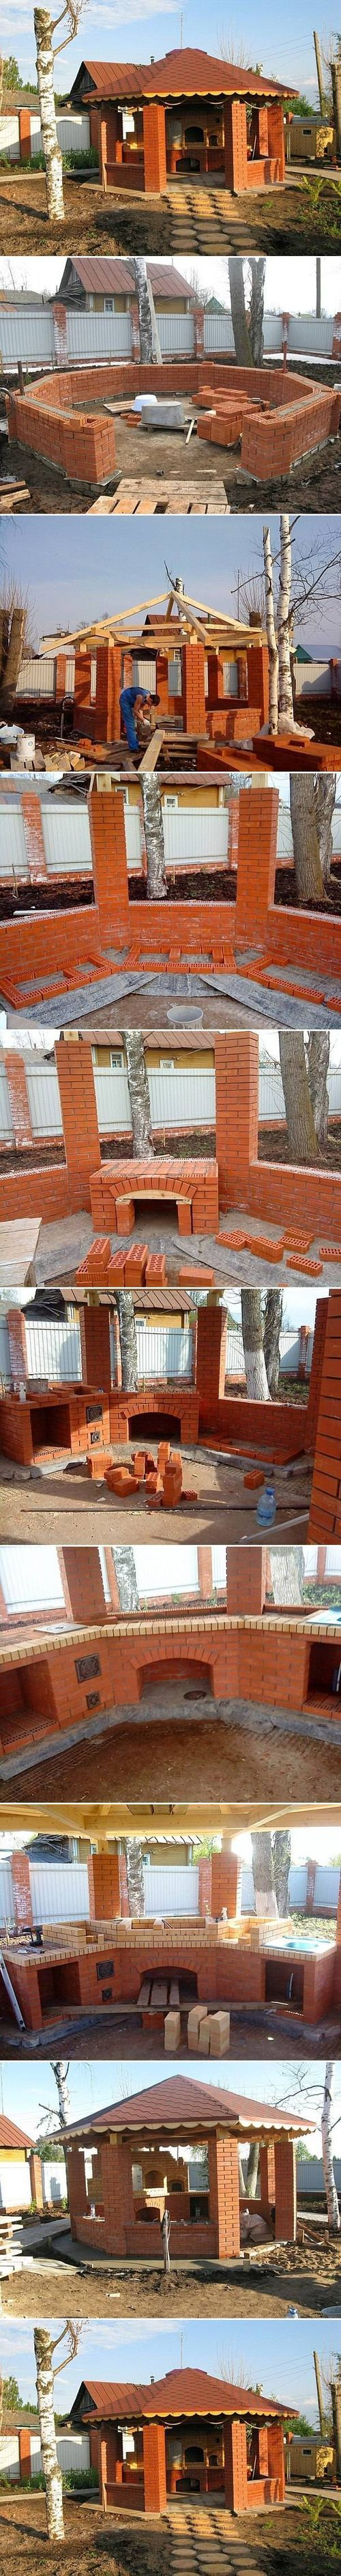 DIY Gazebo with Barbecue DIY Projects / UsefulDIY.com